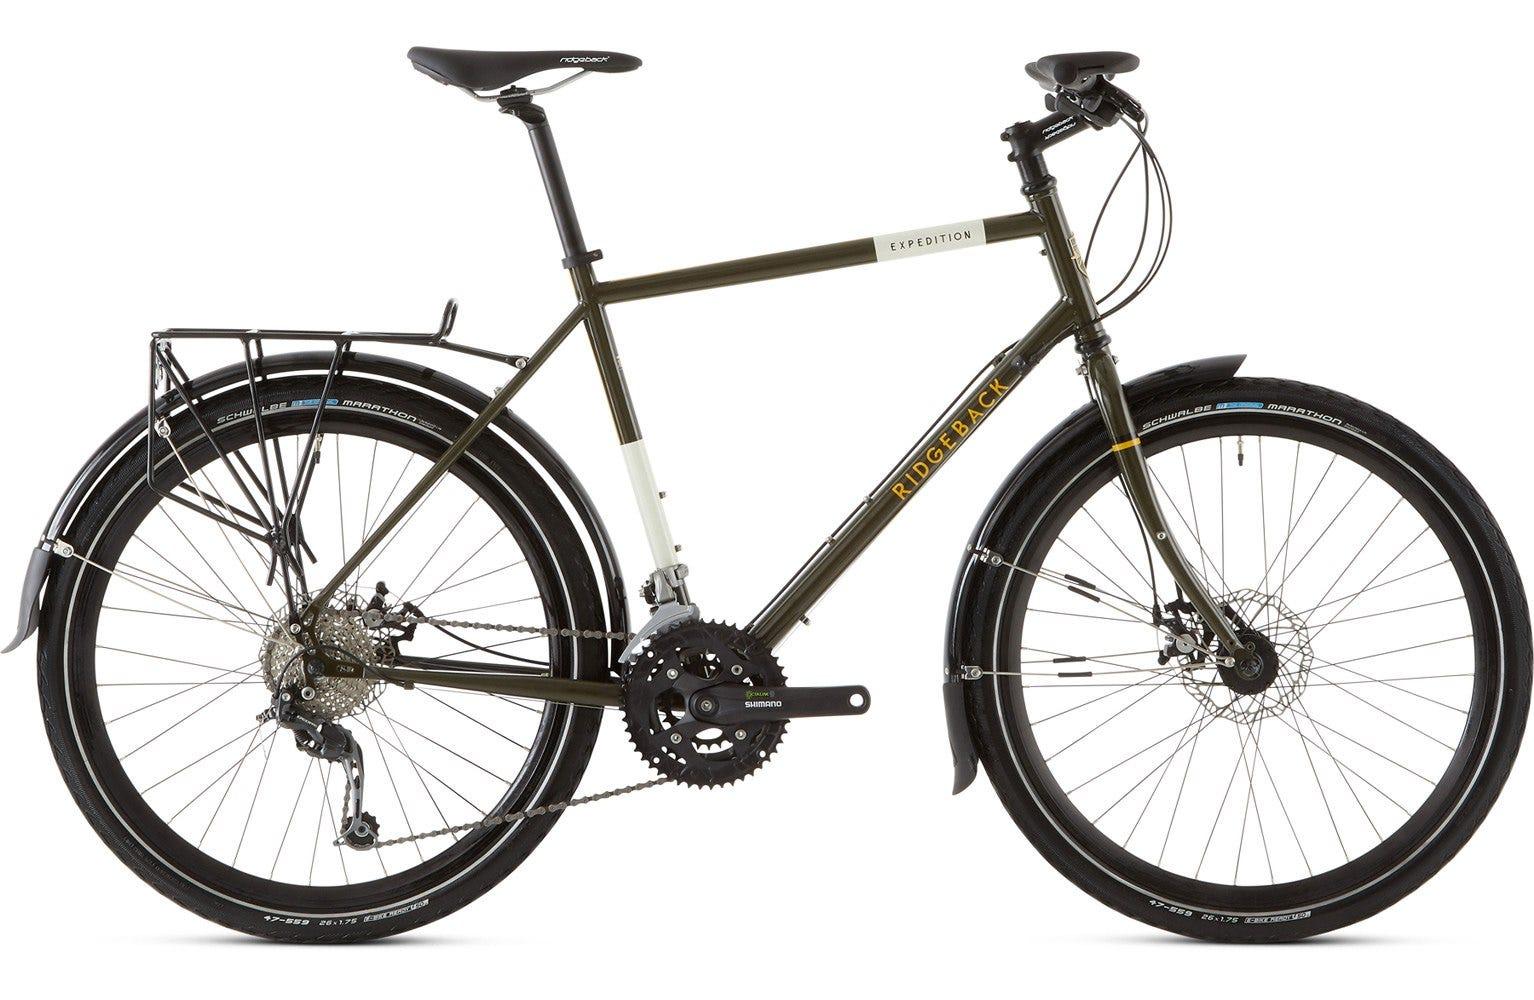 Ridgeback Expedition bike 2019